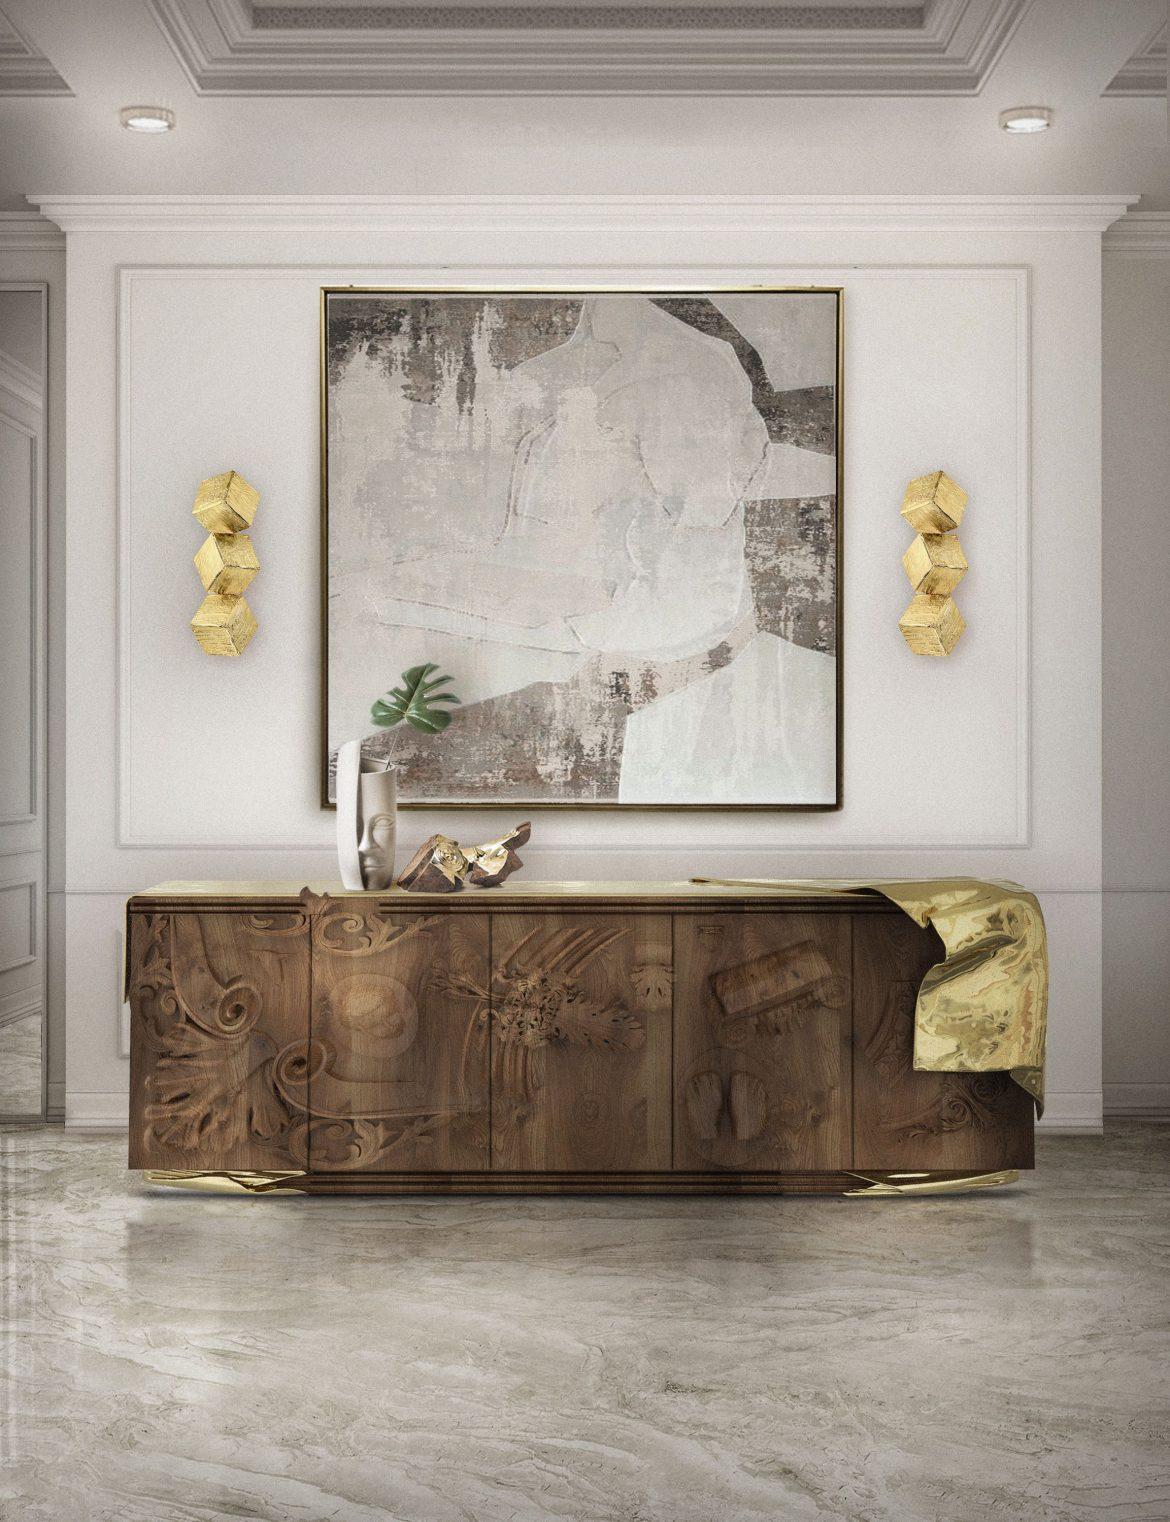 Shop Furniture Online With Interior Design Magazines furniture online Shop Furniture Online With Interior Design Magazines shop furniture online with interior design magazines 2